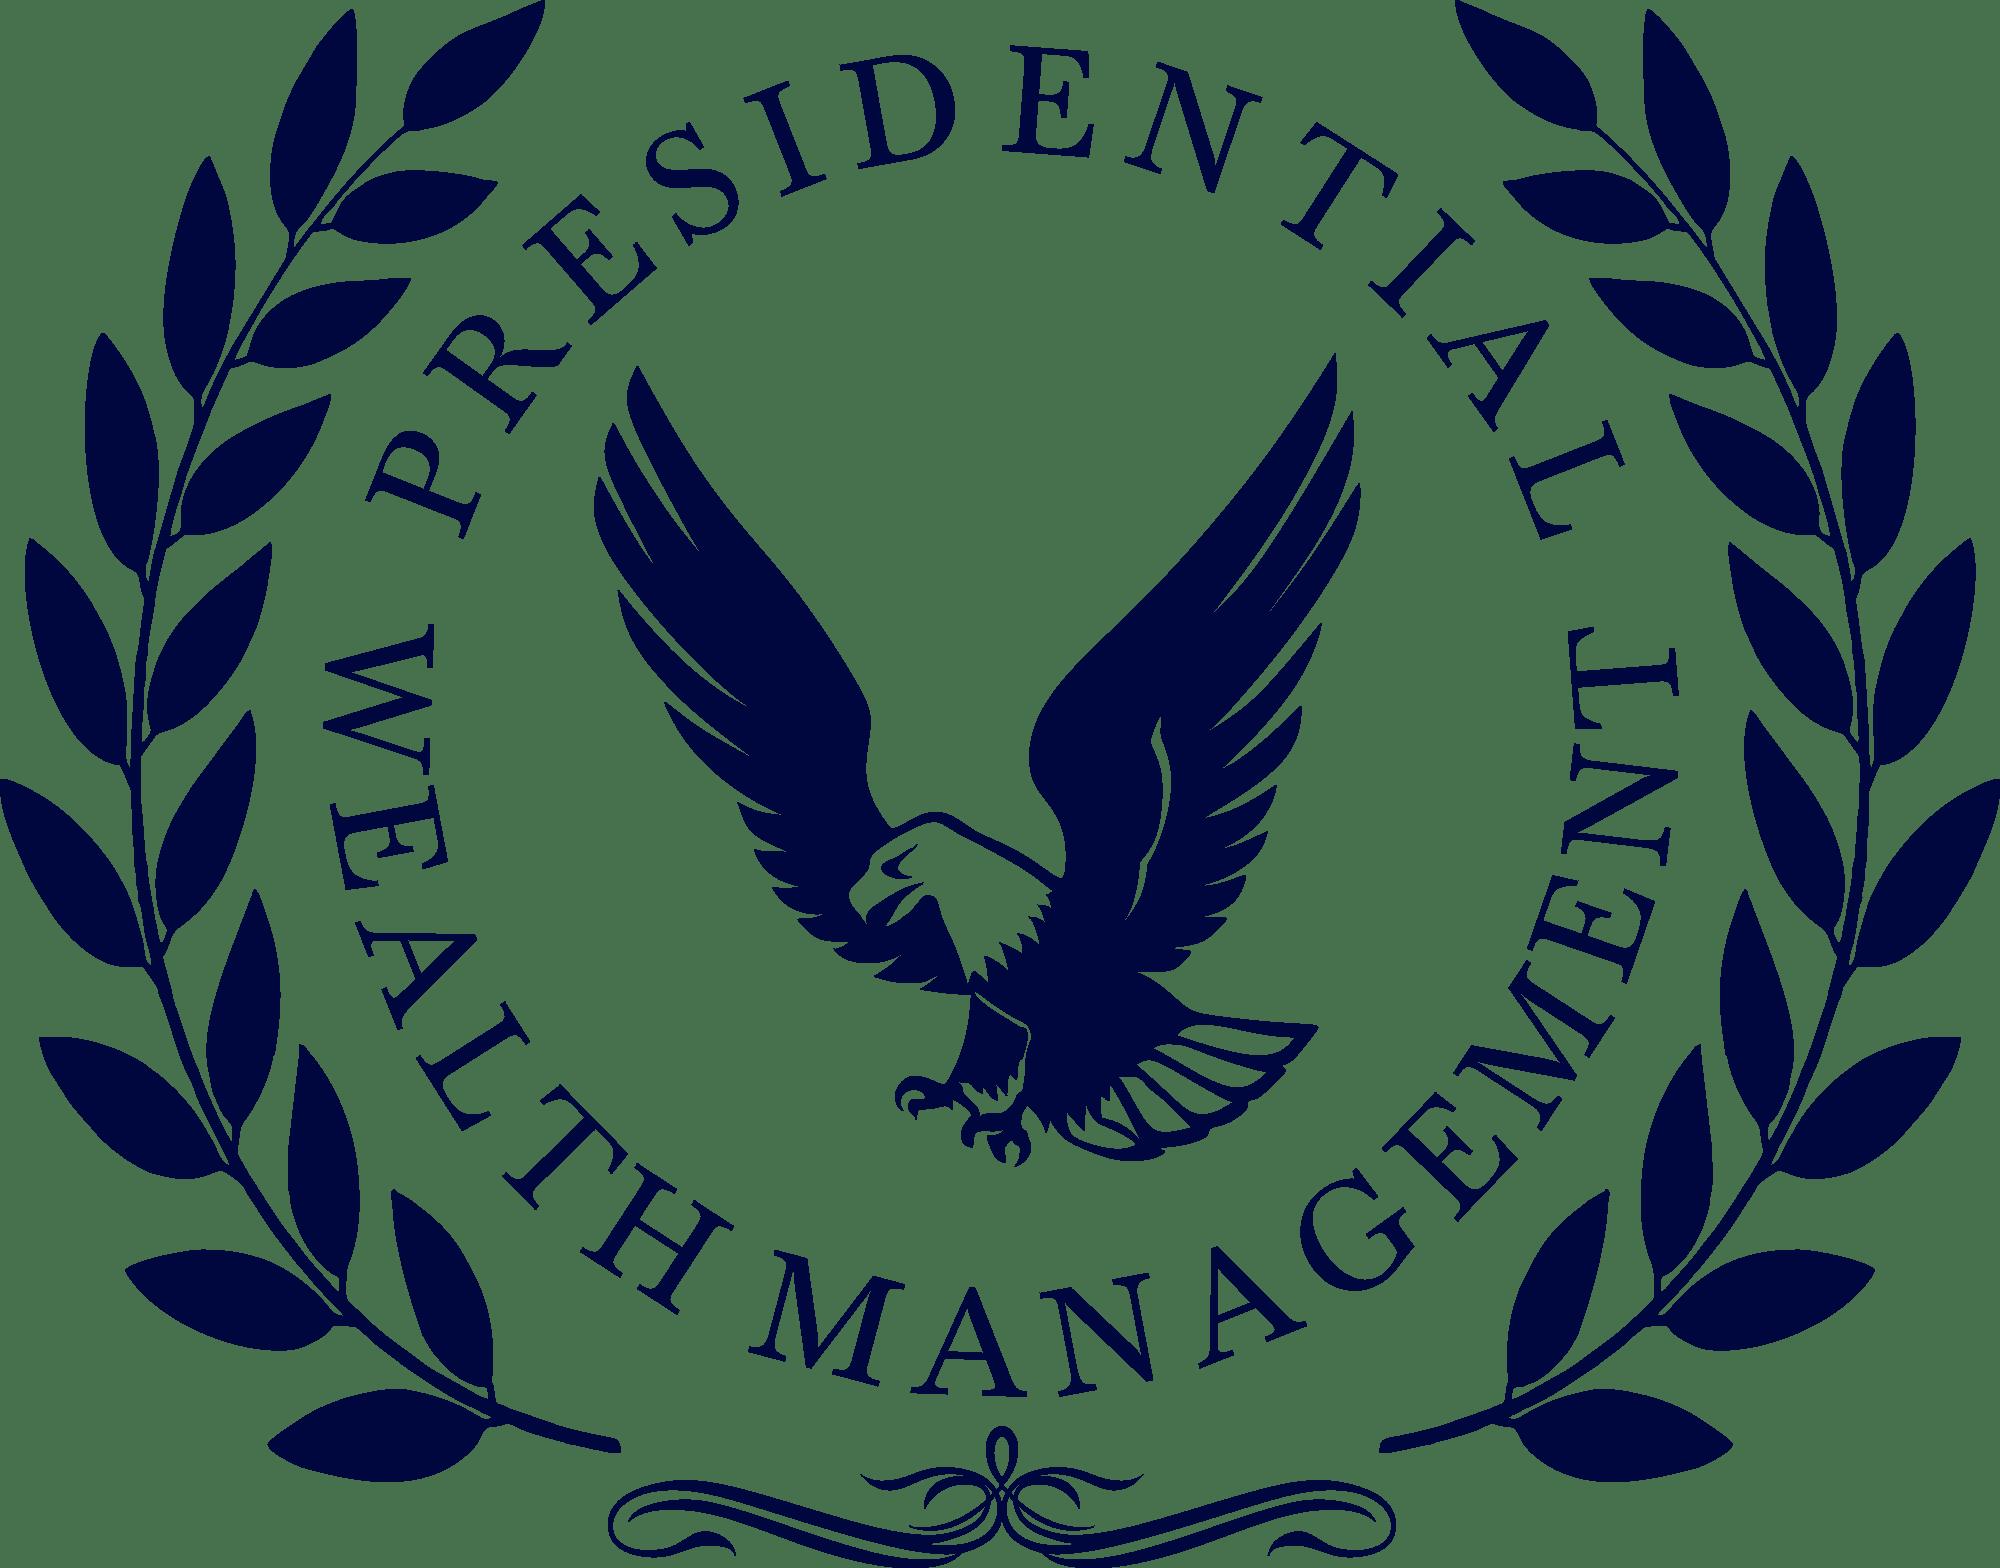 Presidential Wealth Management